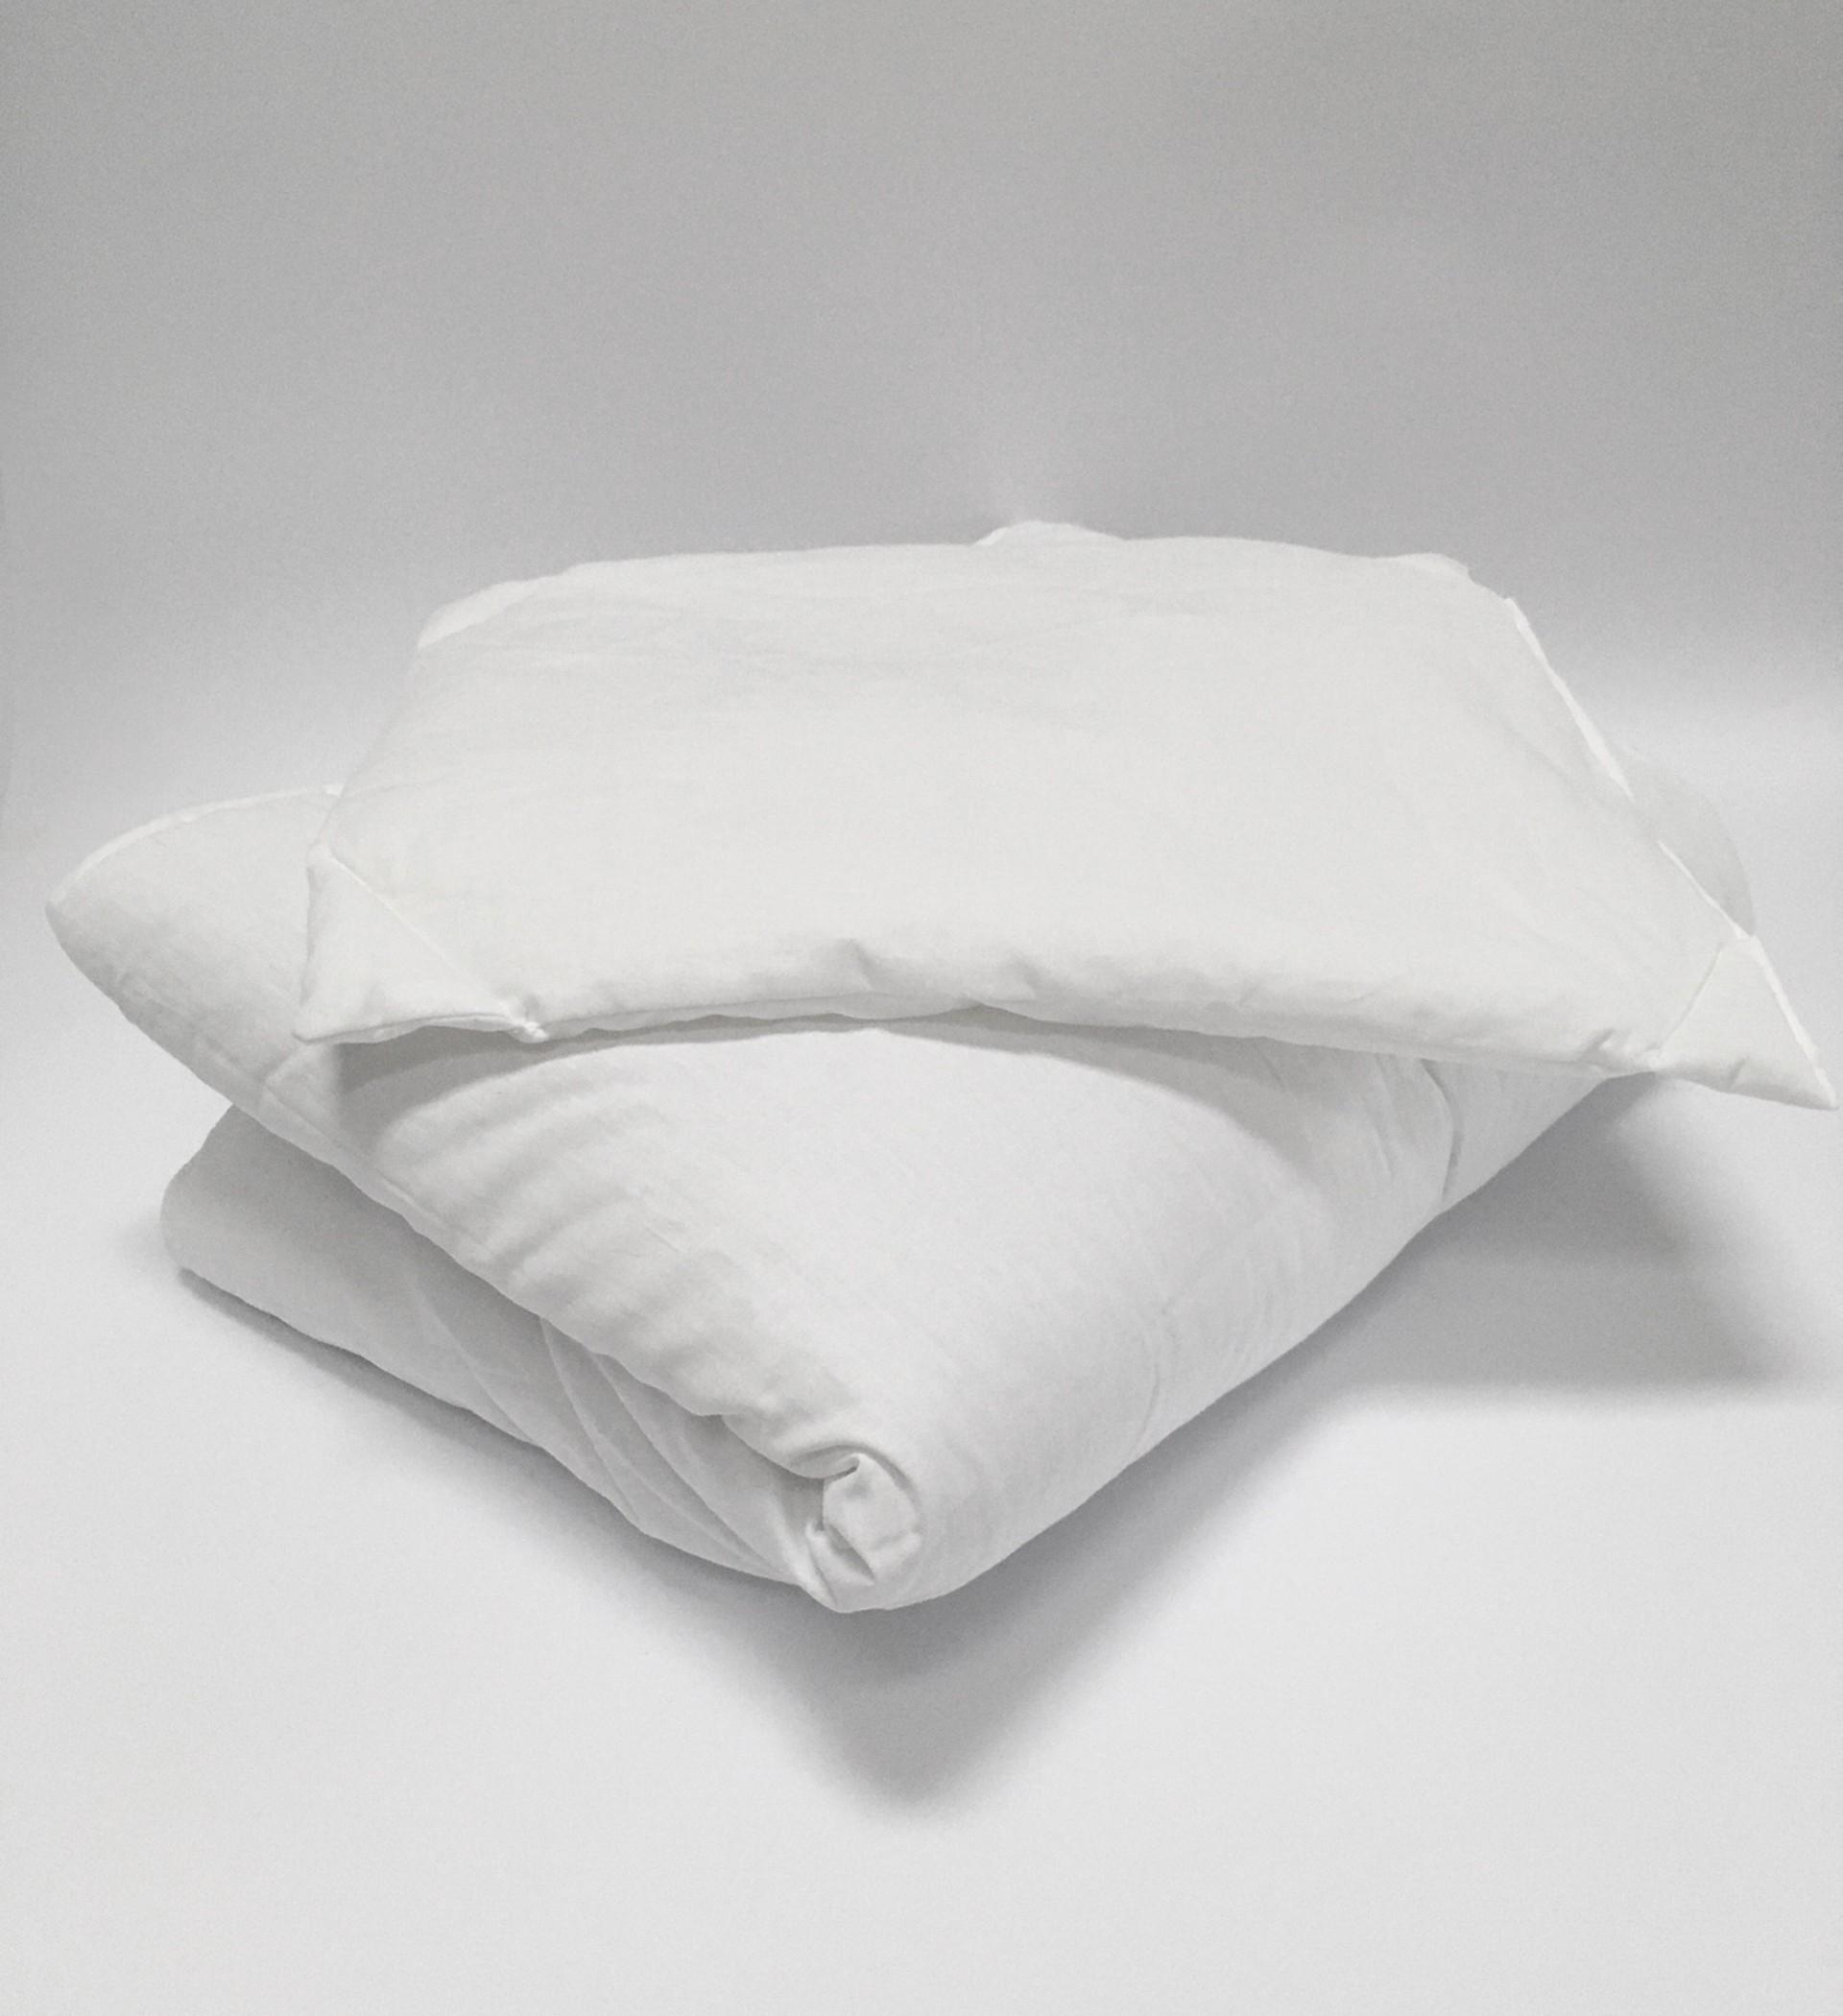 Rossa komplet posteljine, poplun i jastuk